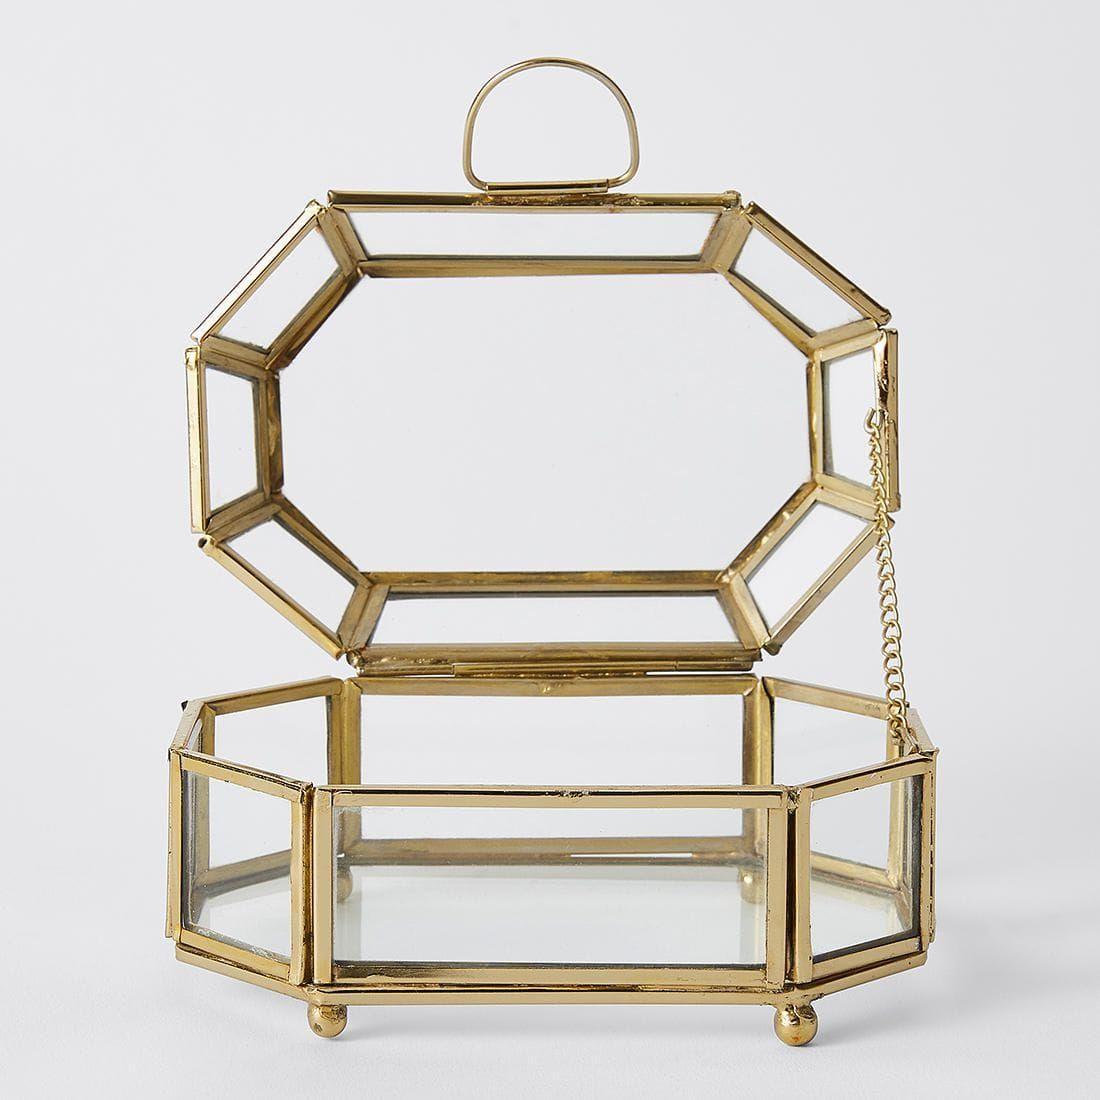 Mirrored Jewelry Box Target - Jewelry